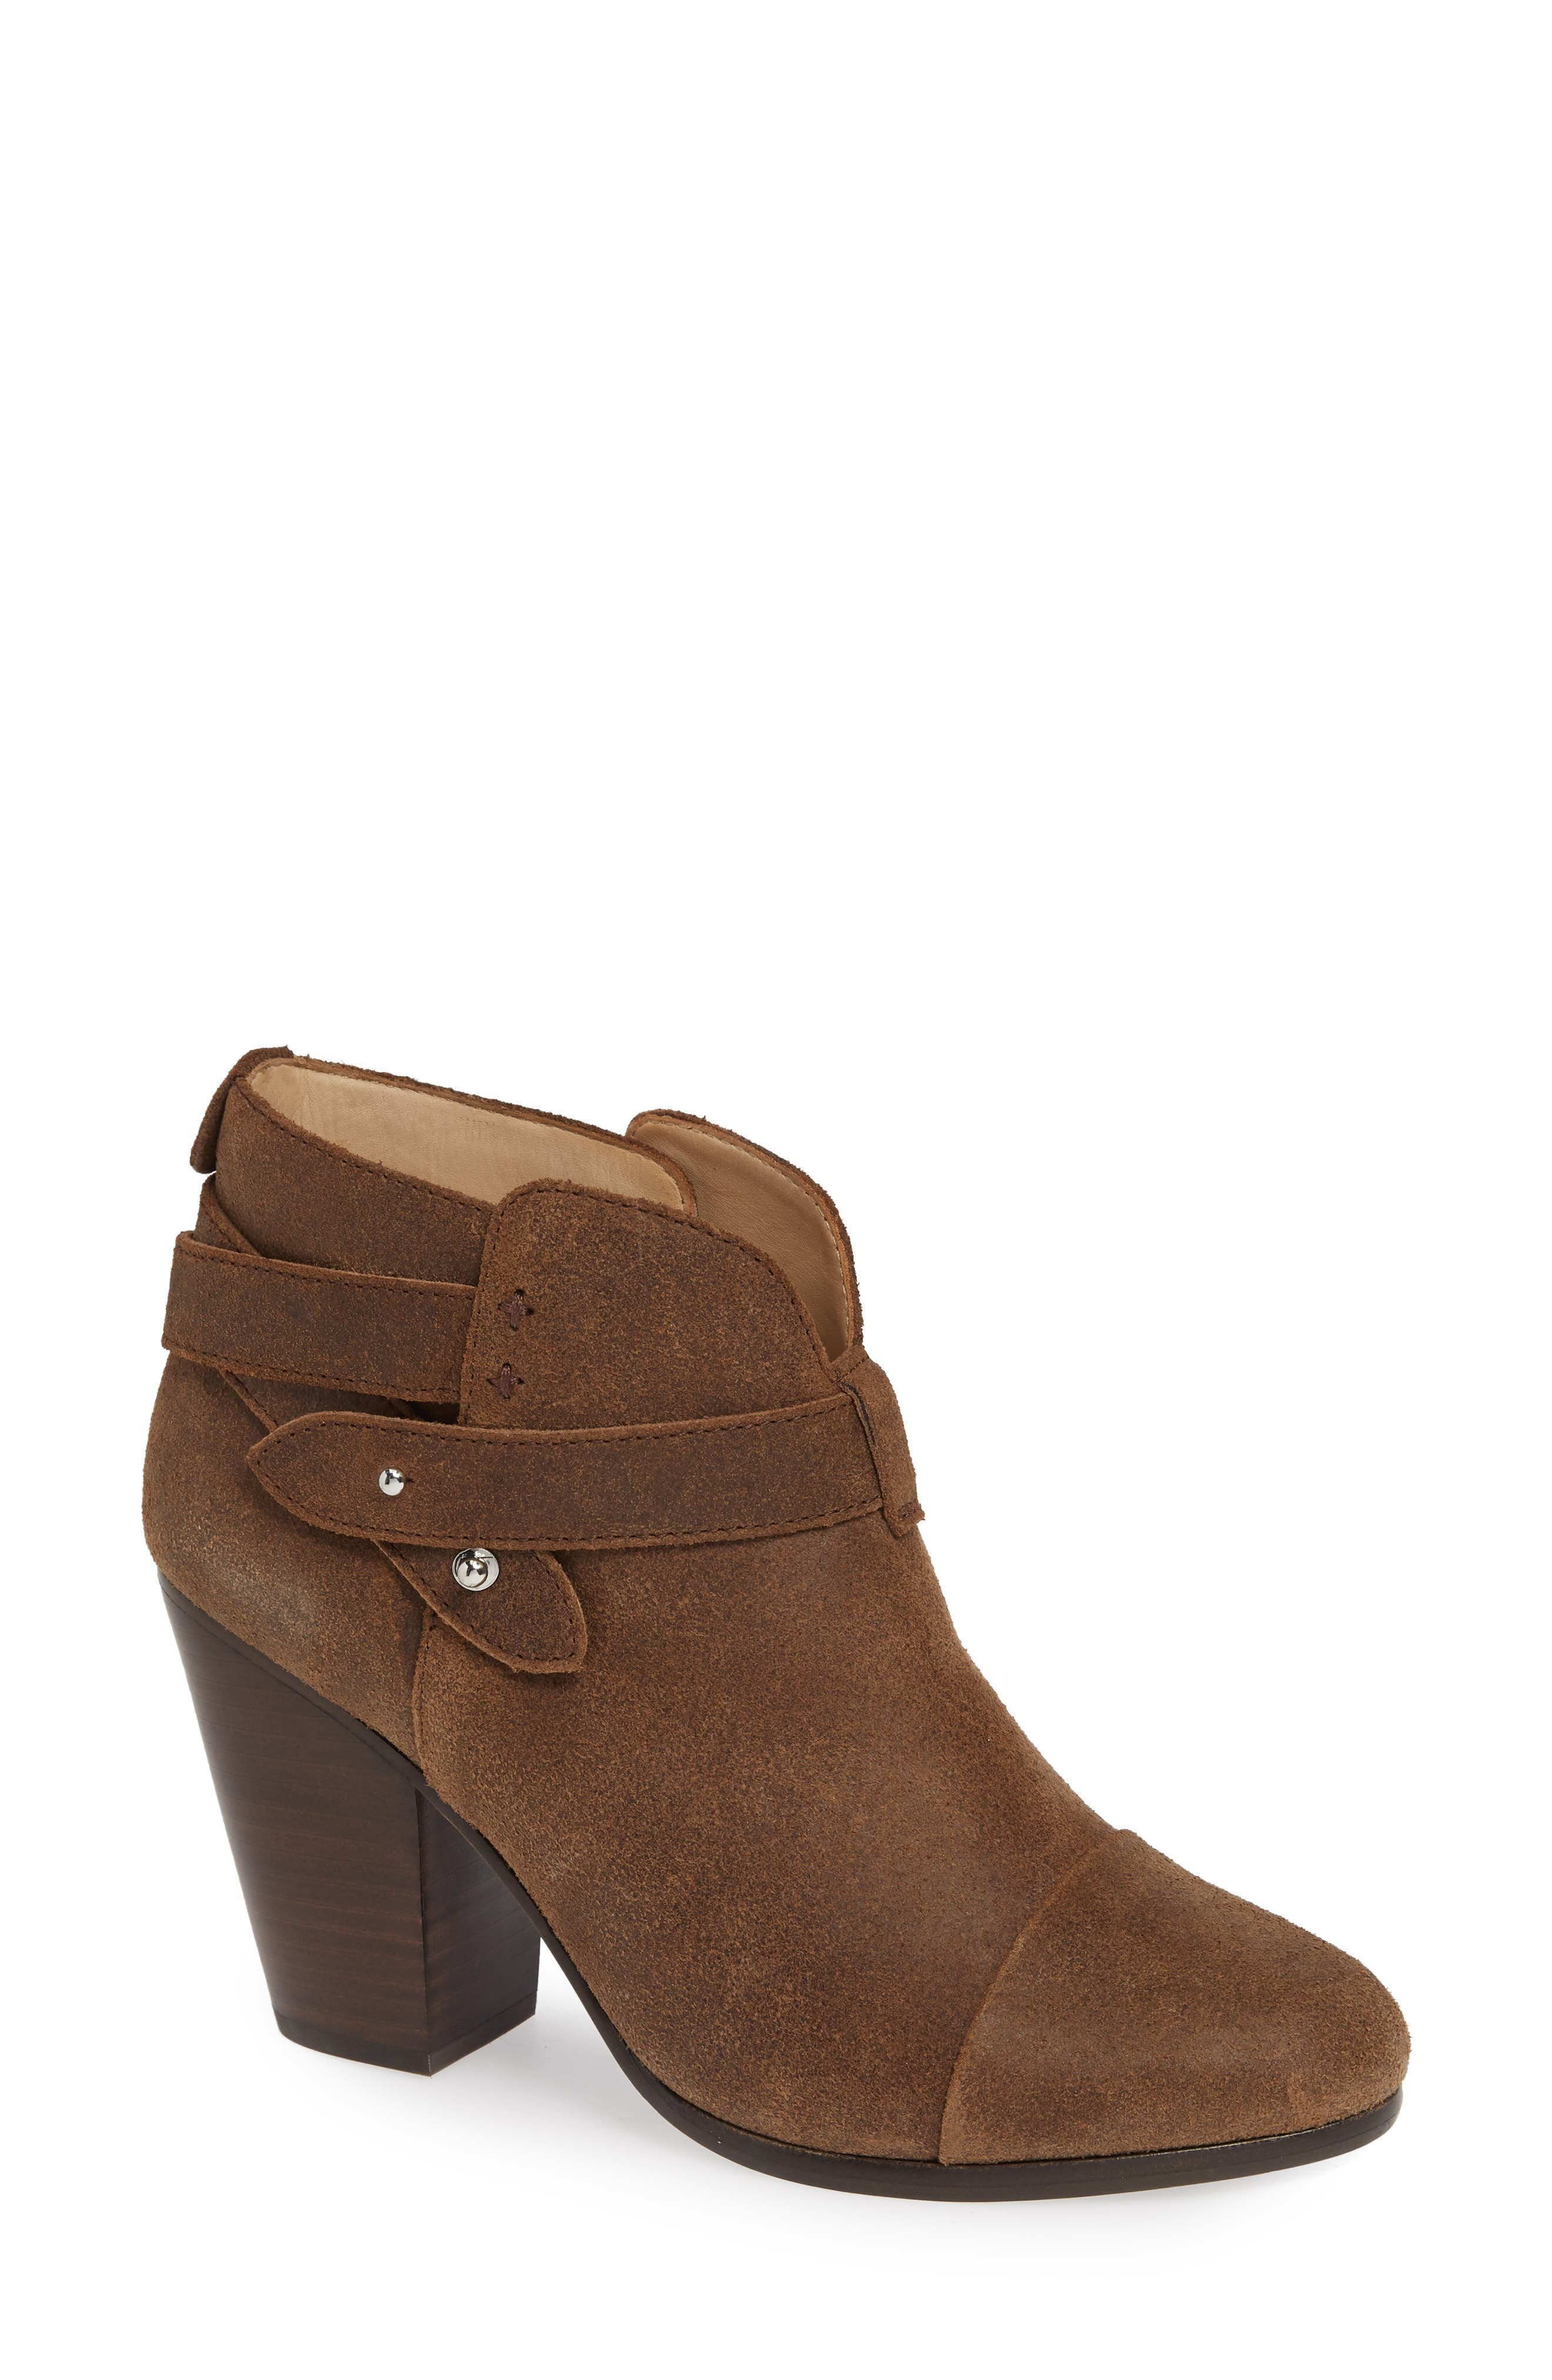 'Harrow' Leather Boot,                         Main,                         color, 200